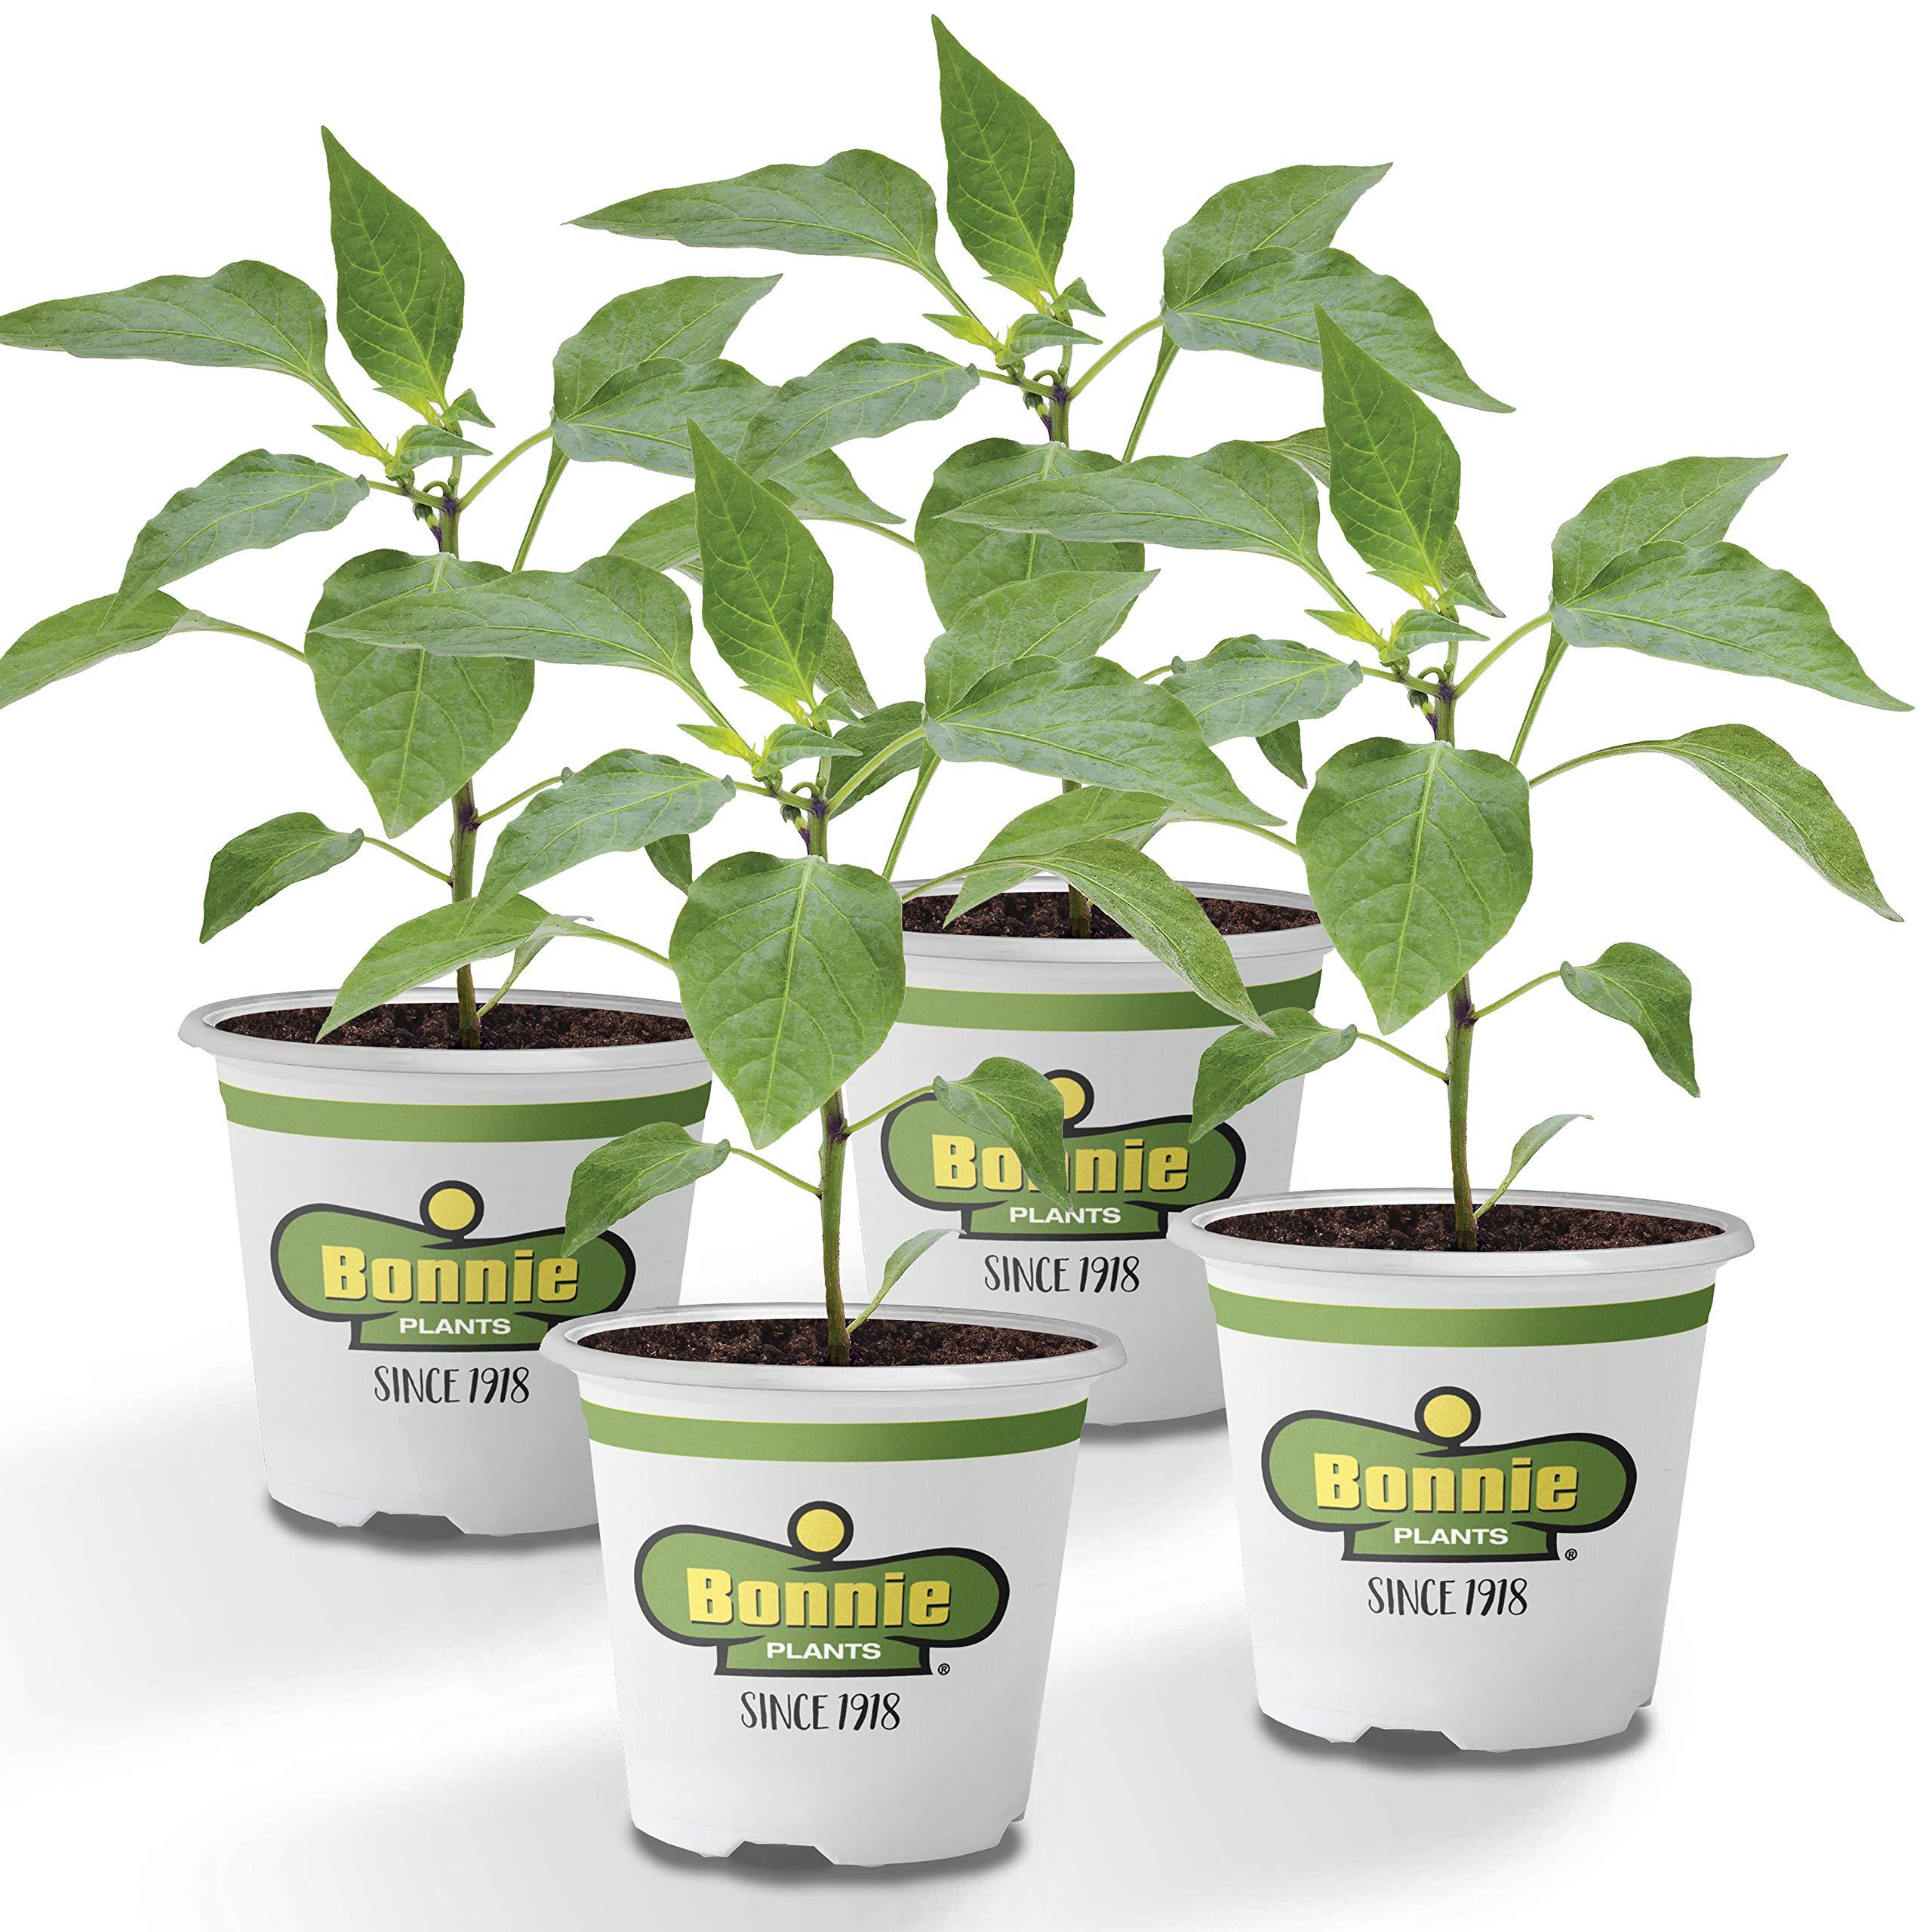 Bonnie Plants Jalapeno Hot Pepper Live Vegetable Plants - 4 Pack | Most Popular Chile Pepper | Non-GMO | 24 - 48 Inch Plants | 3 Inch Pepper Size by Bonnie Plants (Image #1)